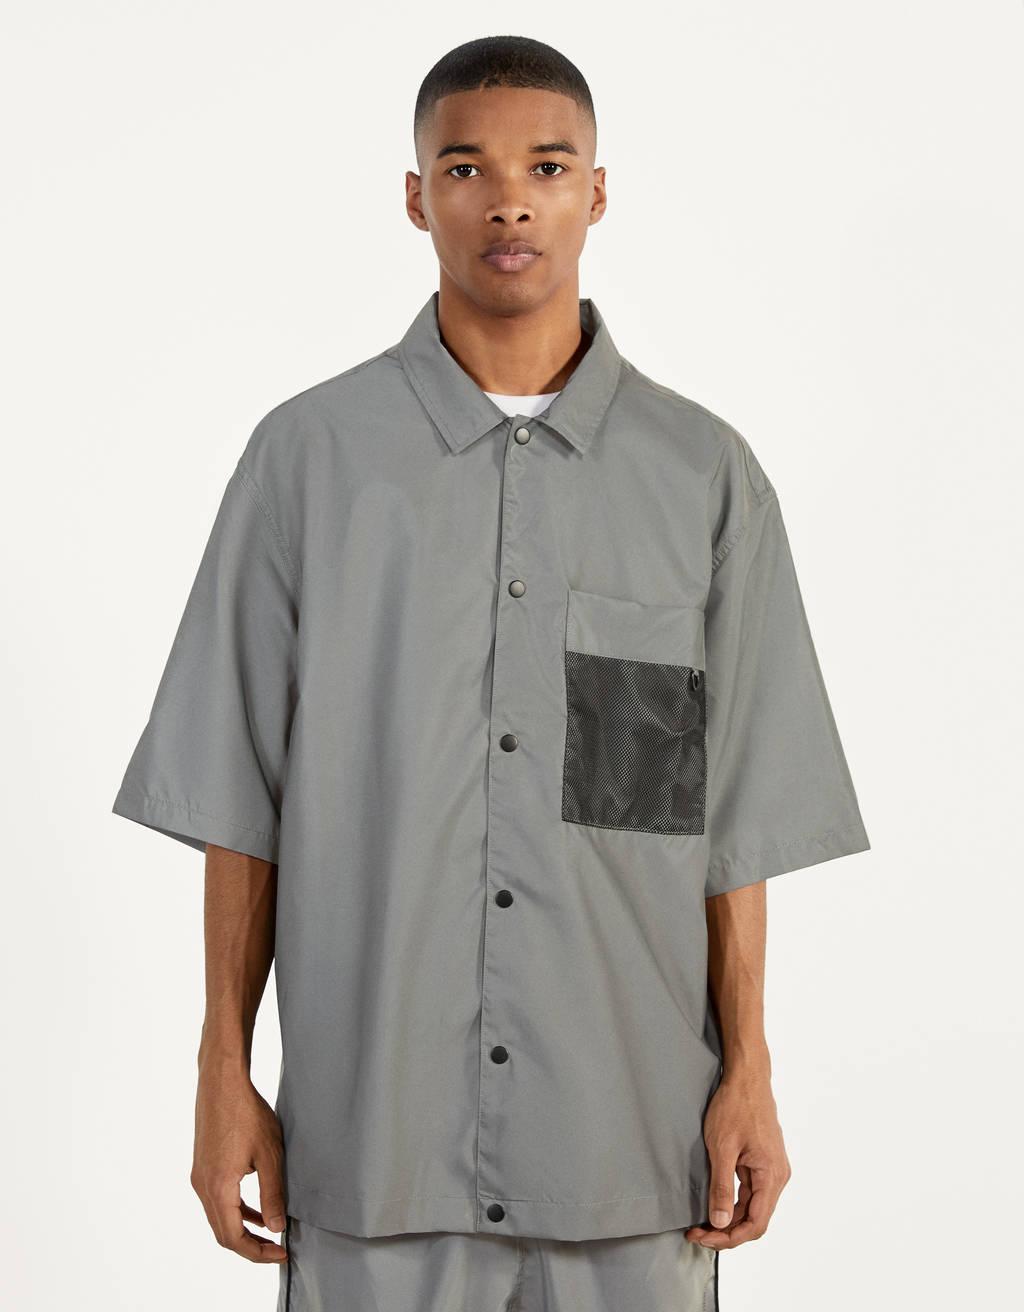 Рубашка со светоотражающими деталями